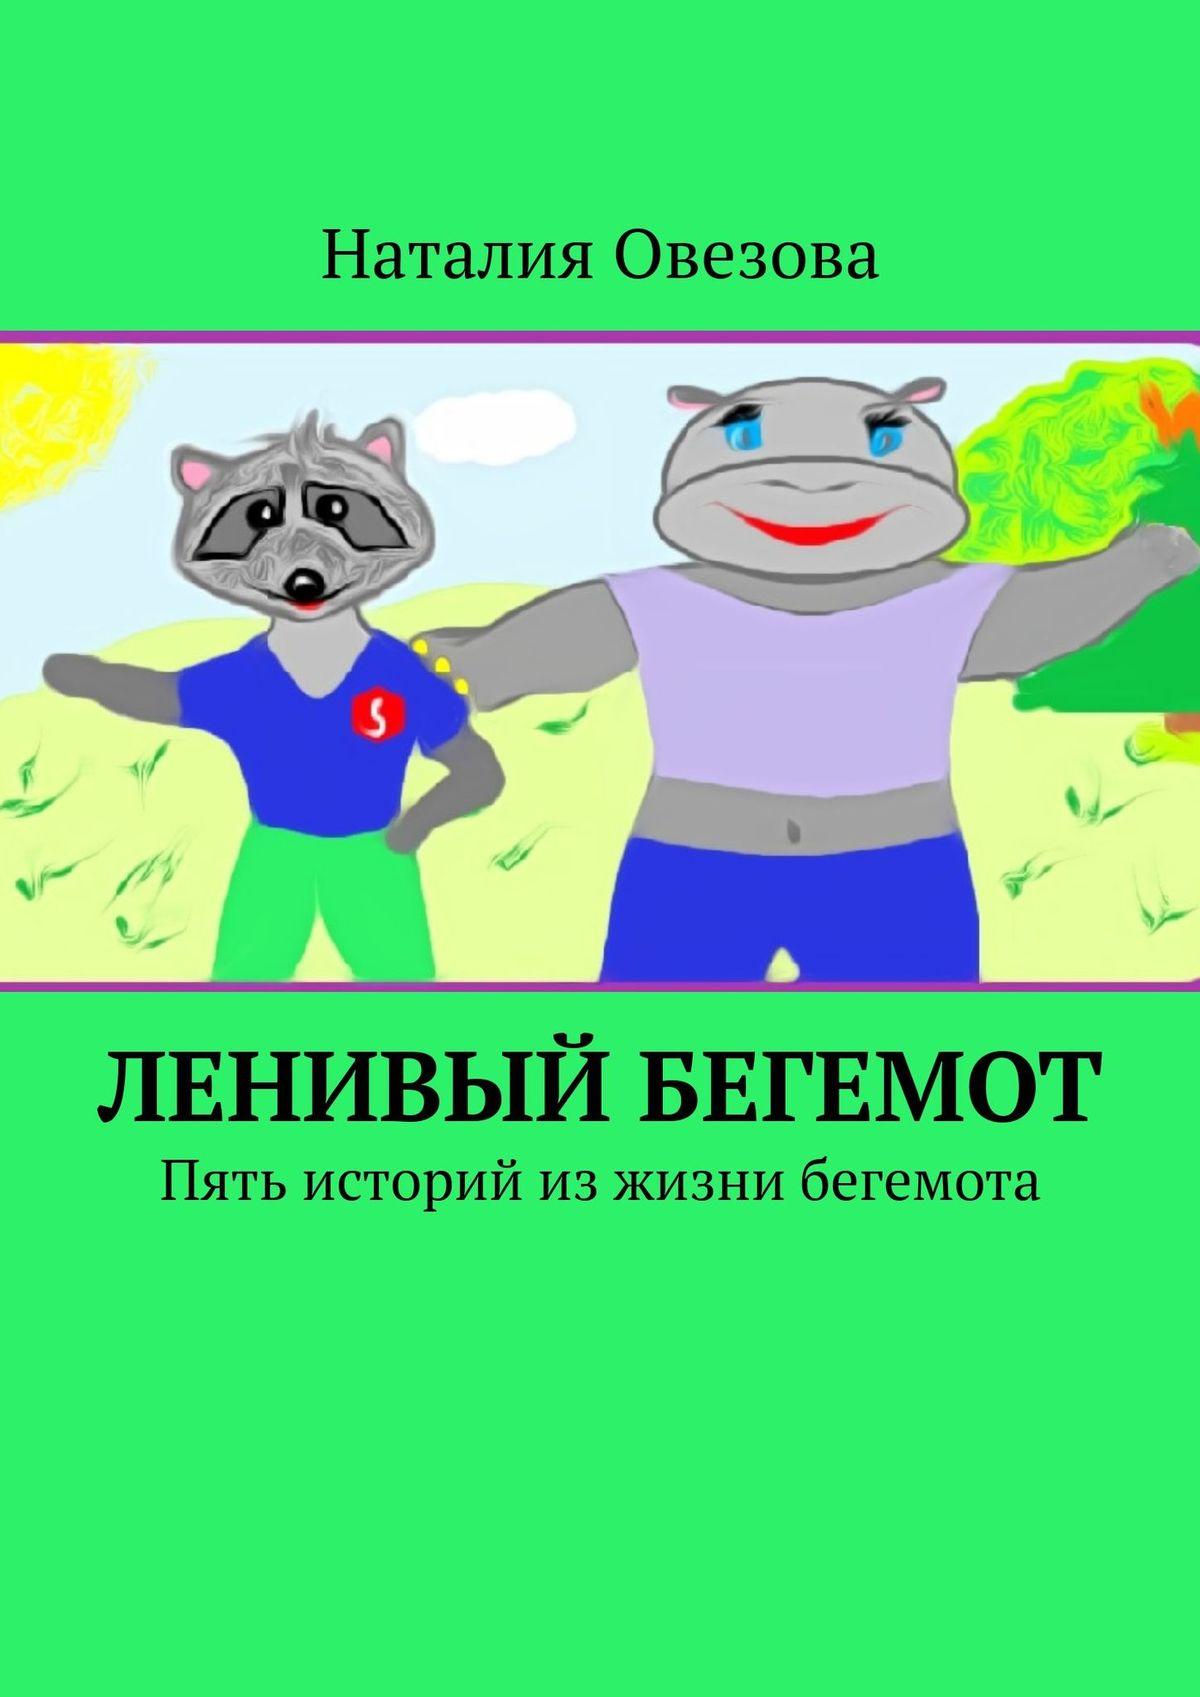 Наталия Александровна Овезова Ленивый Бегемот. Стихи для детей цена